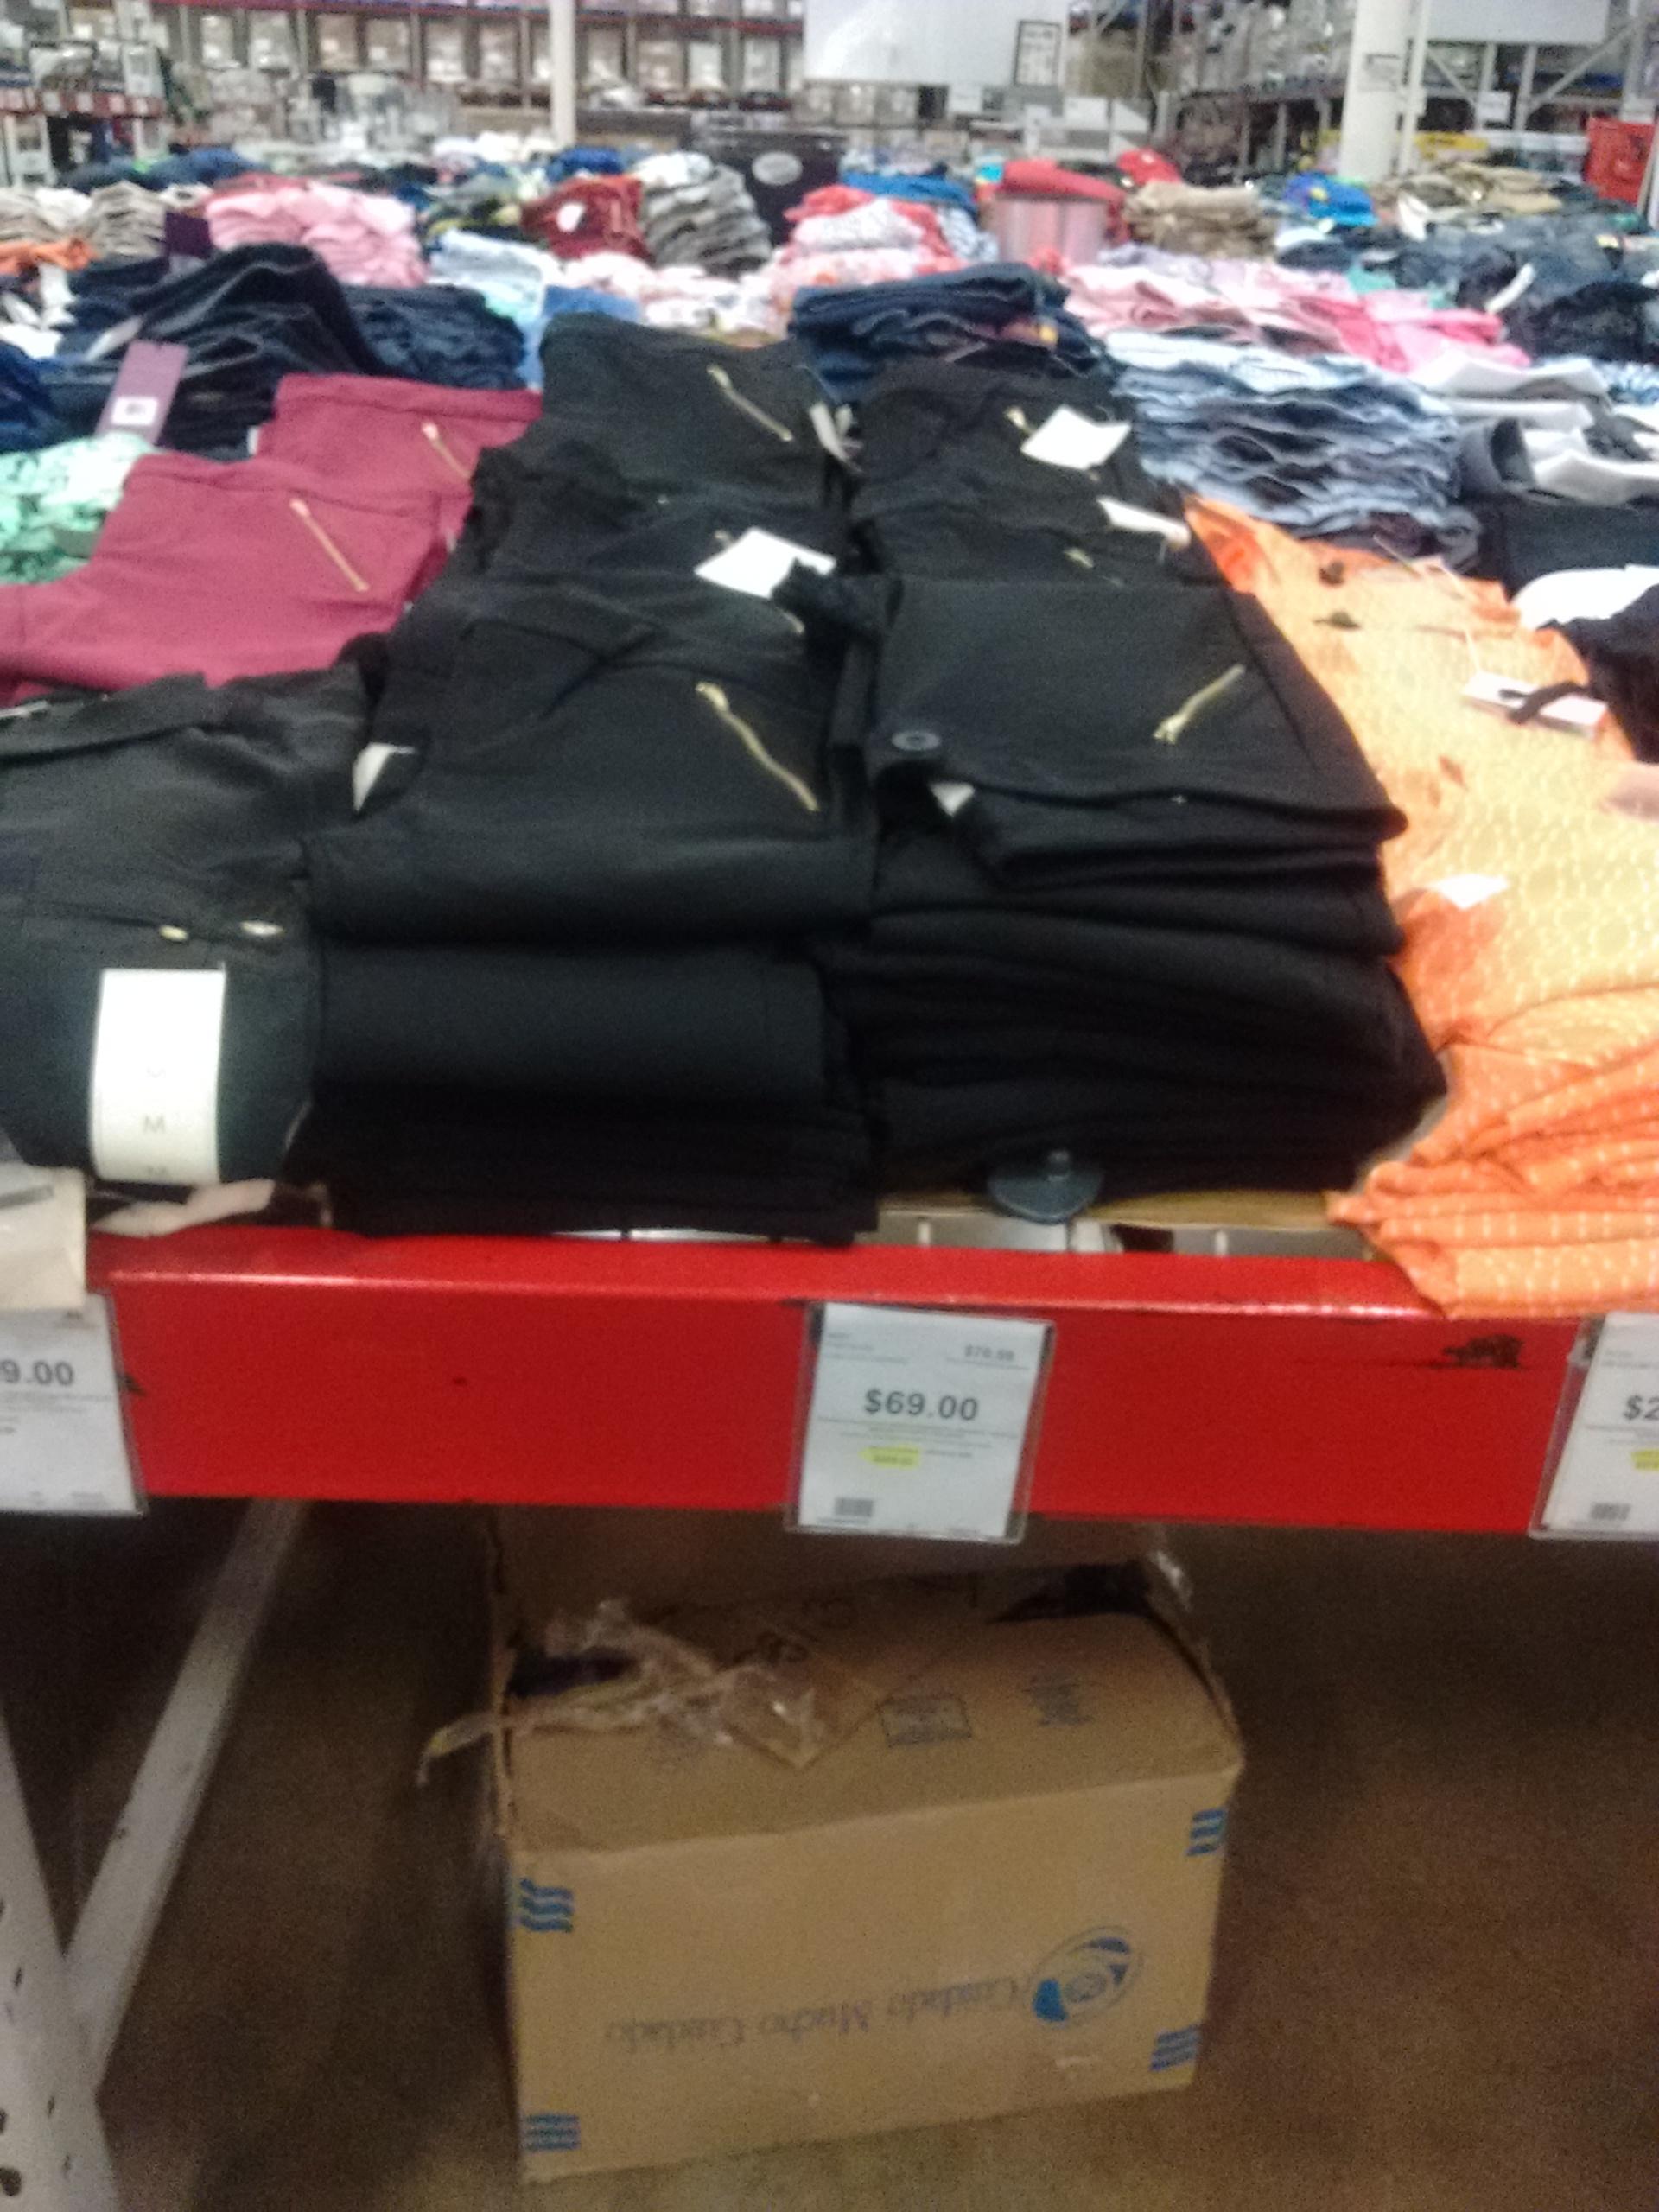 City Club Tampico: Pantalón strech a $70